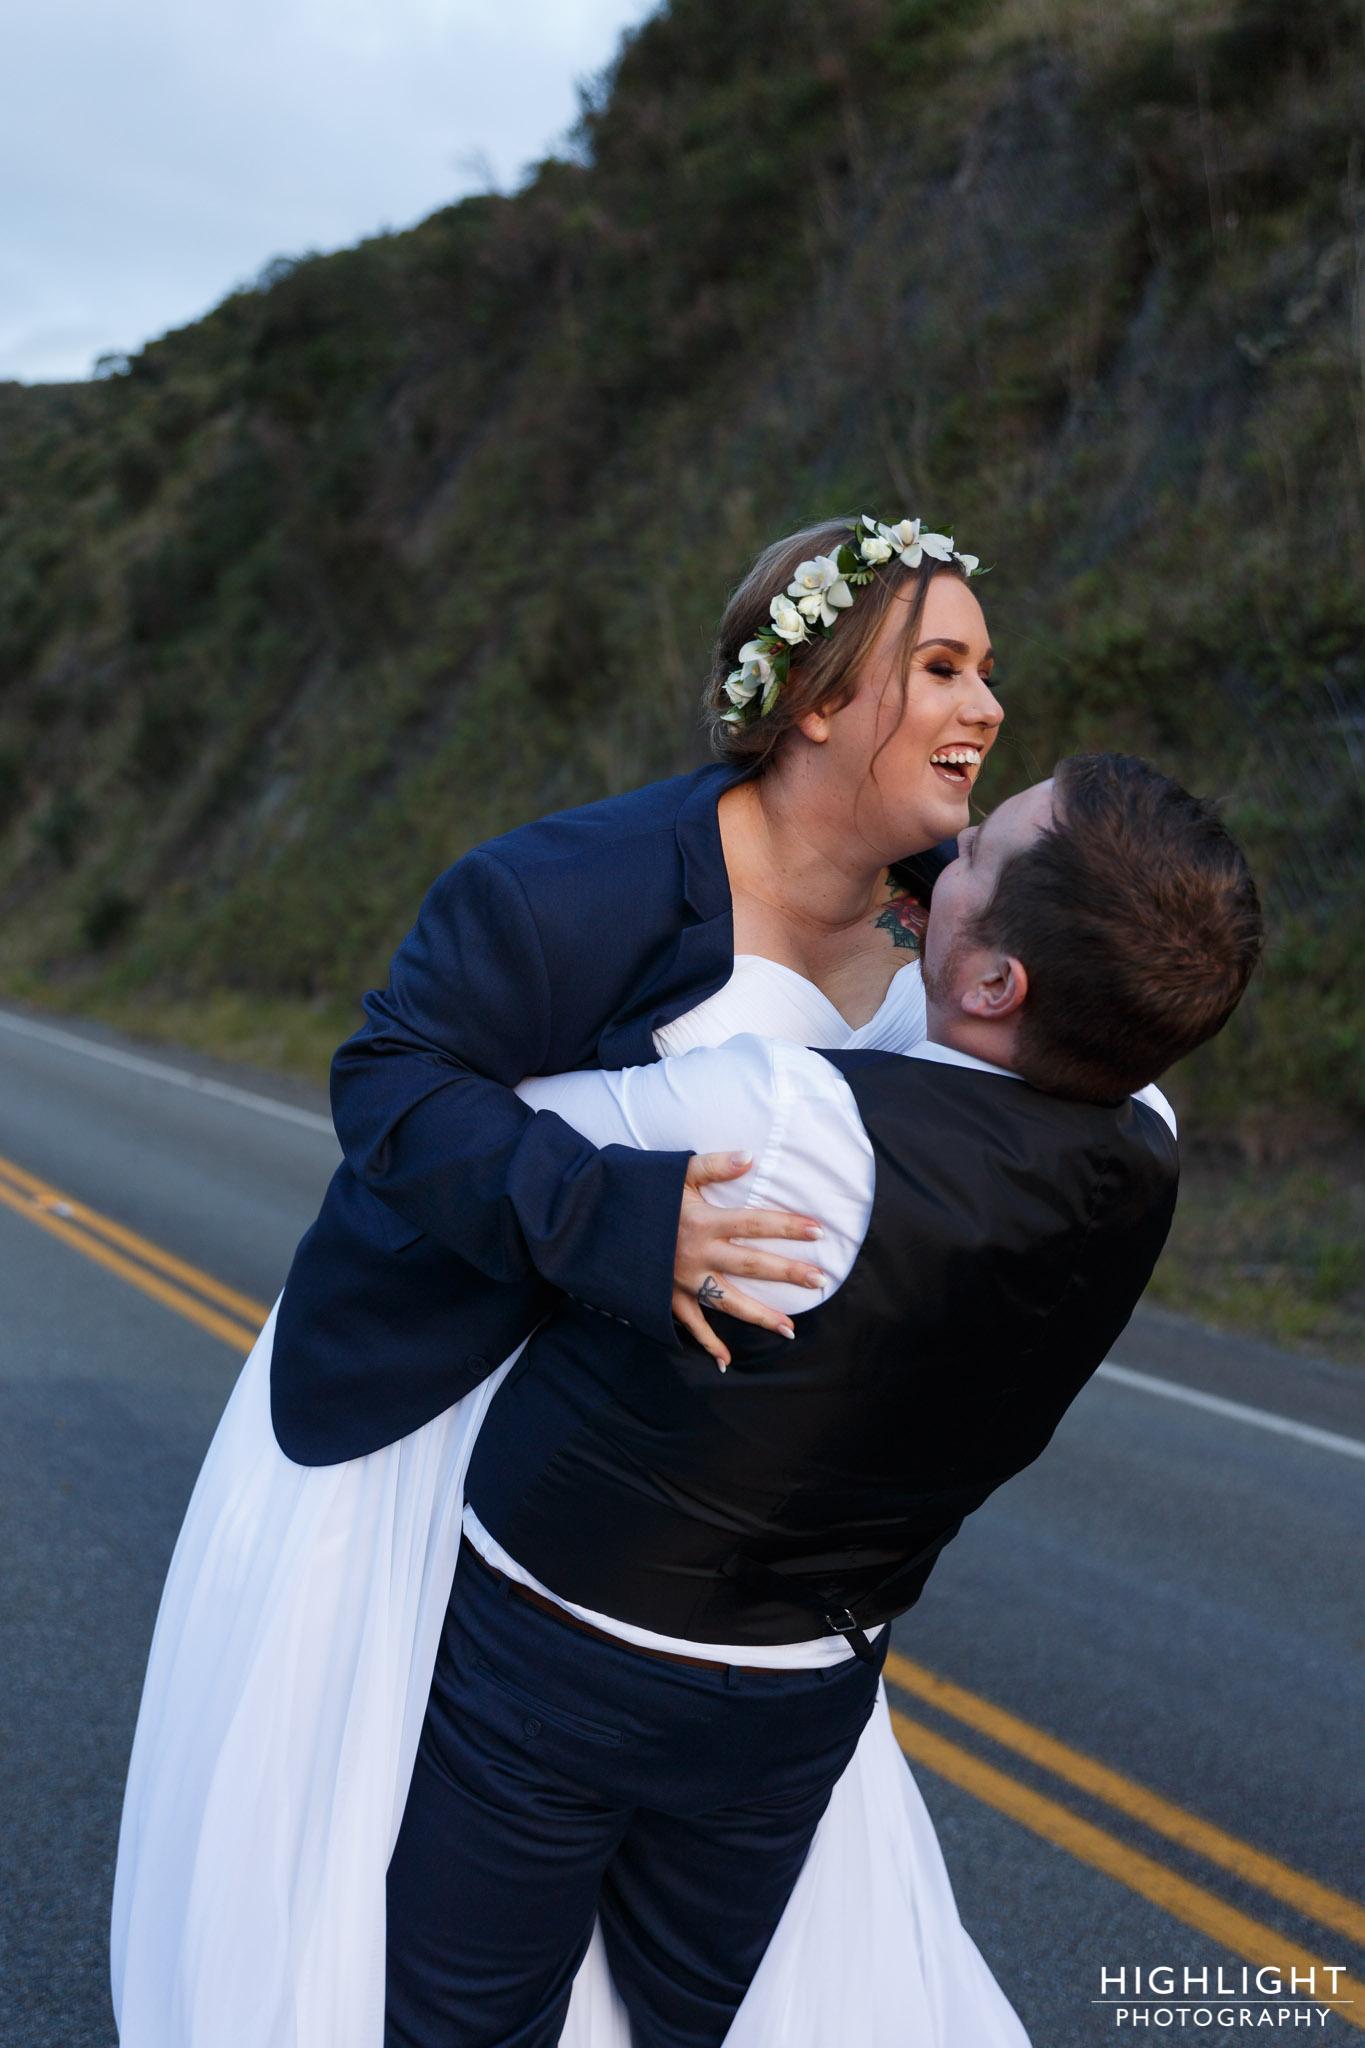 Highlight-wedding-photography-new-zealand-palmerston-north-95.jpg